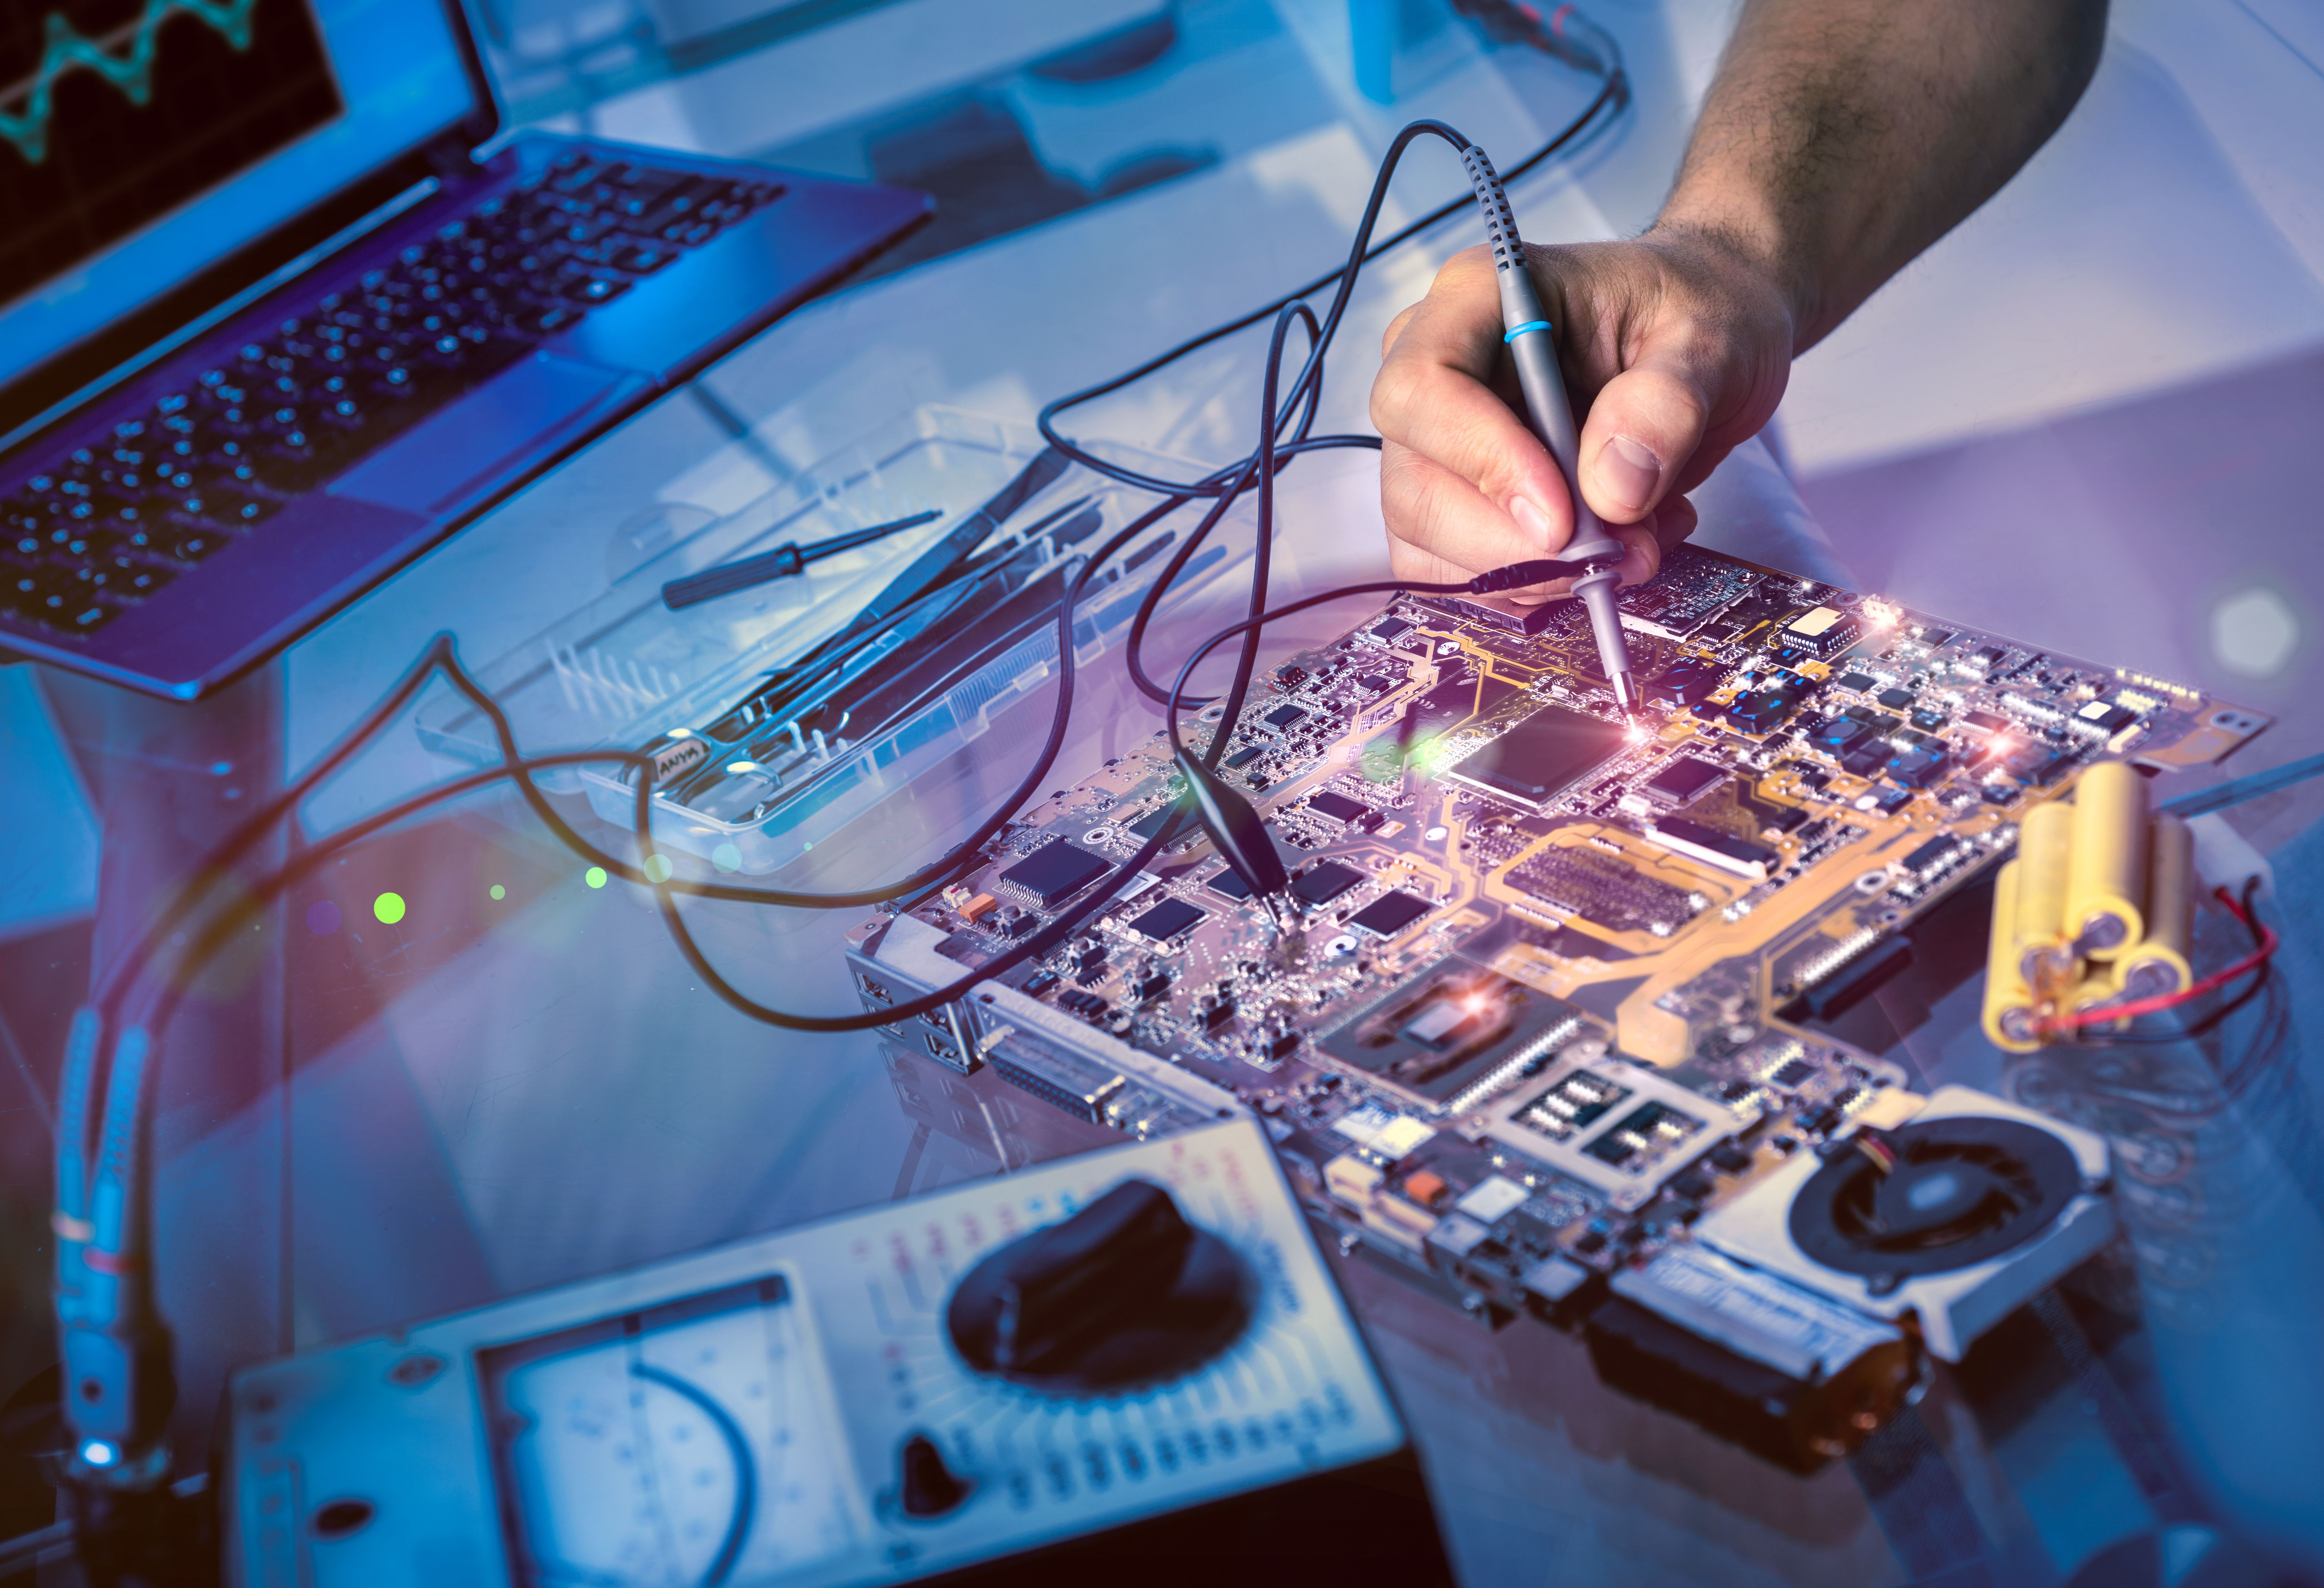 Reparación de ordenadores: Servicios especializados de Informática Ecoservei